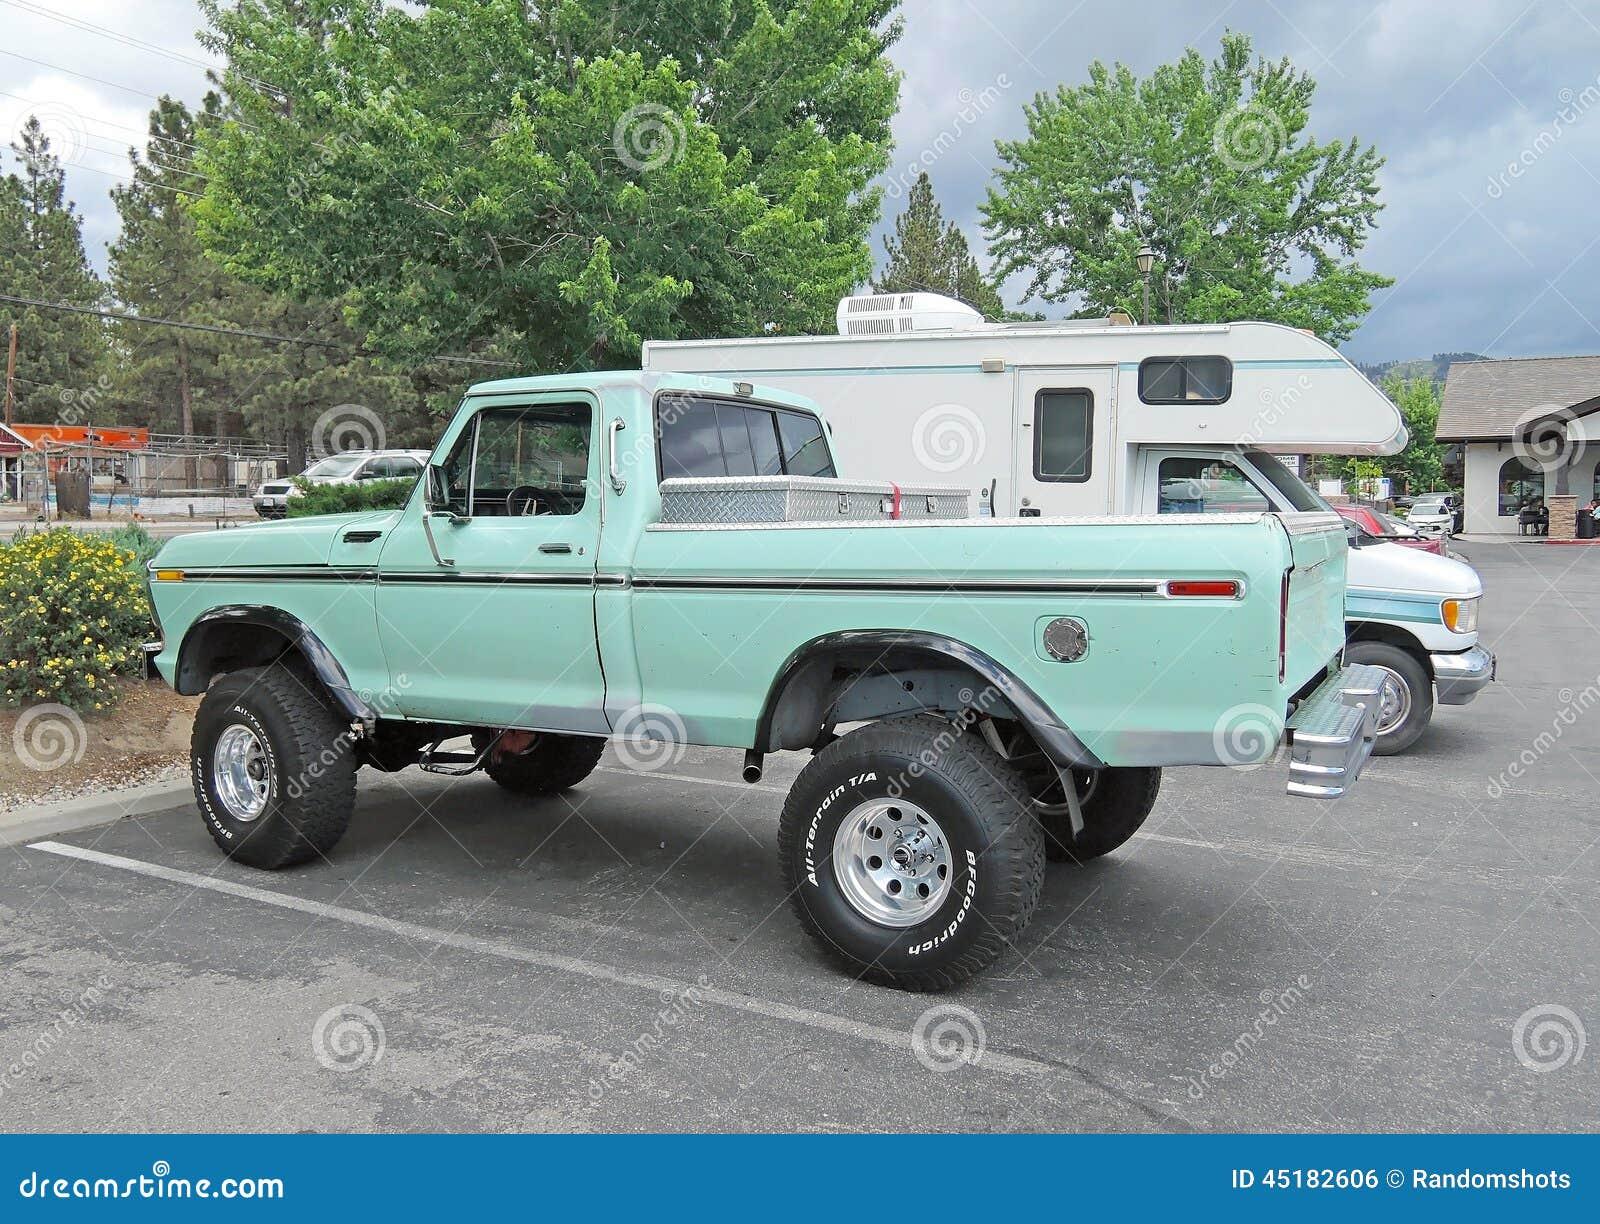 ford truck editorial photo image 45182606. Black Bedroom Furniture Sets. Home Design Ideas